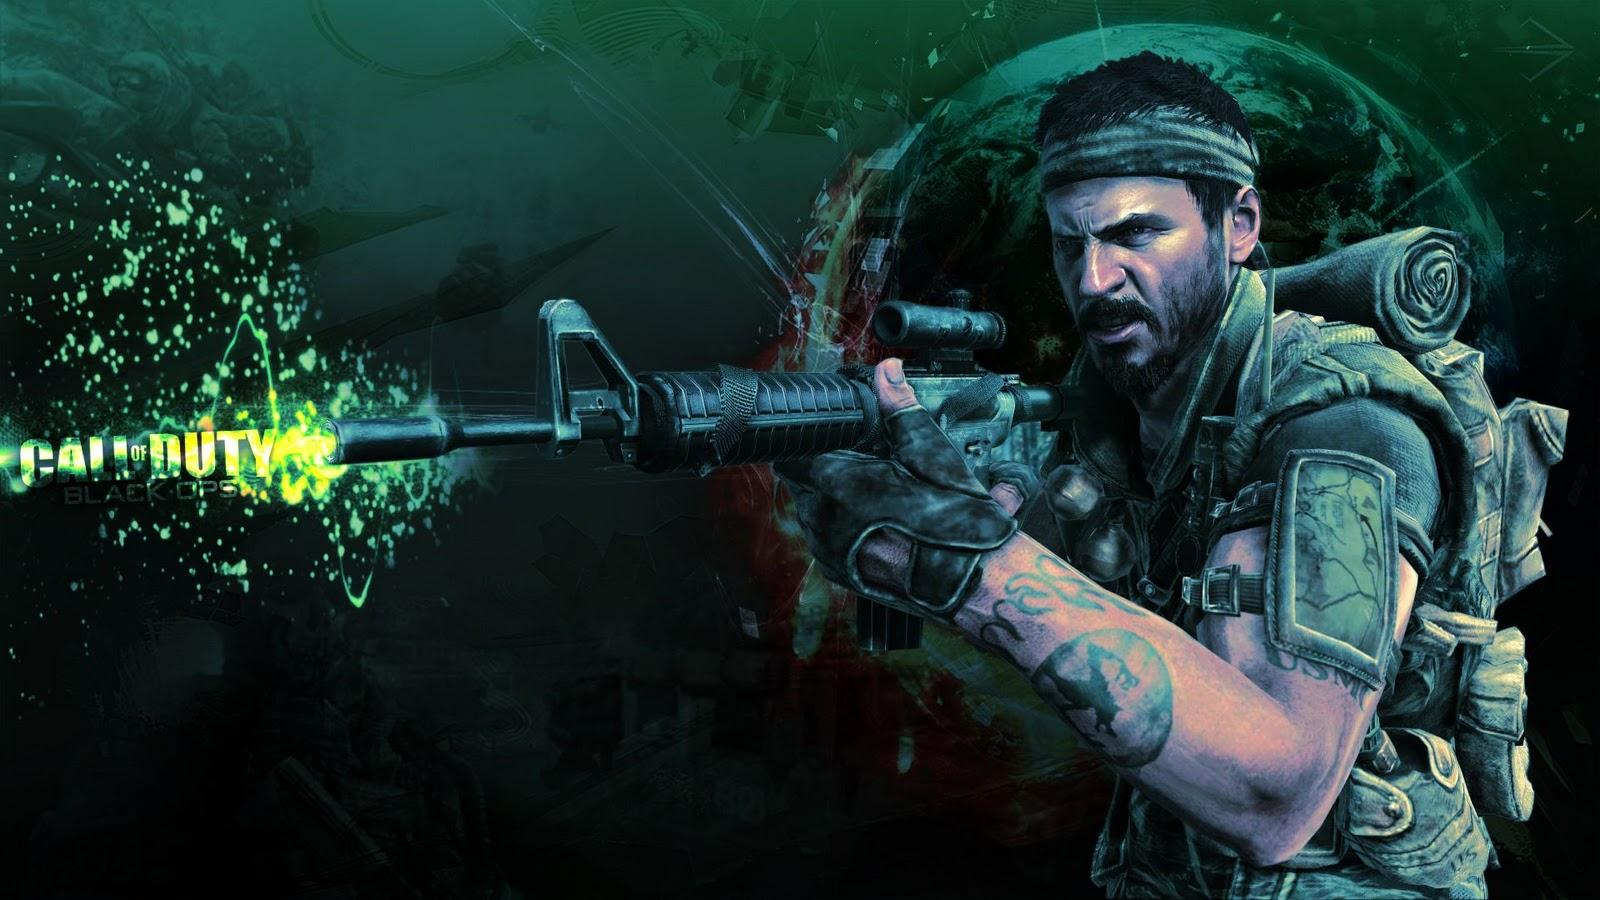 Call of Duty HD Wallpaper HD Wallpapers 1600x900